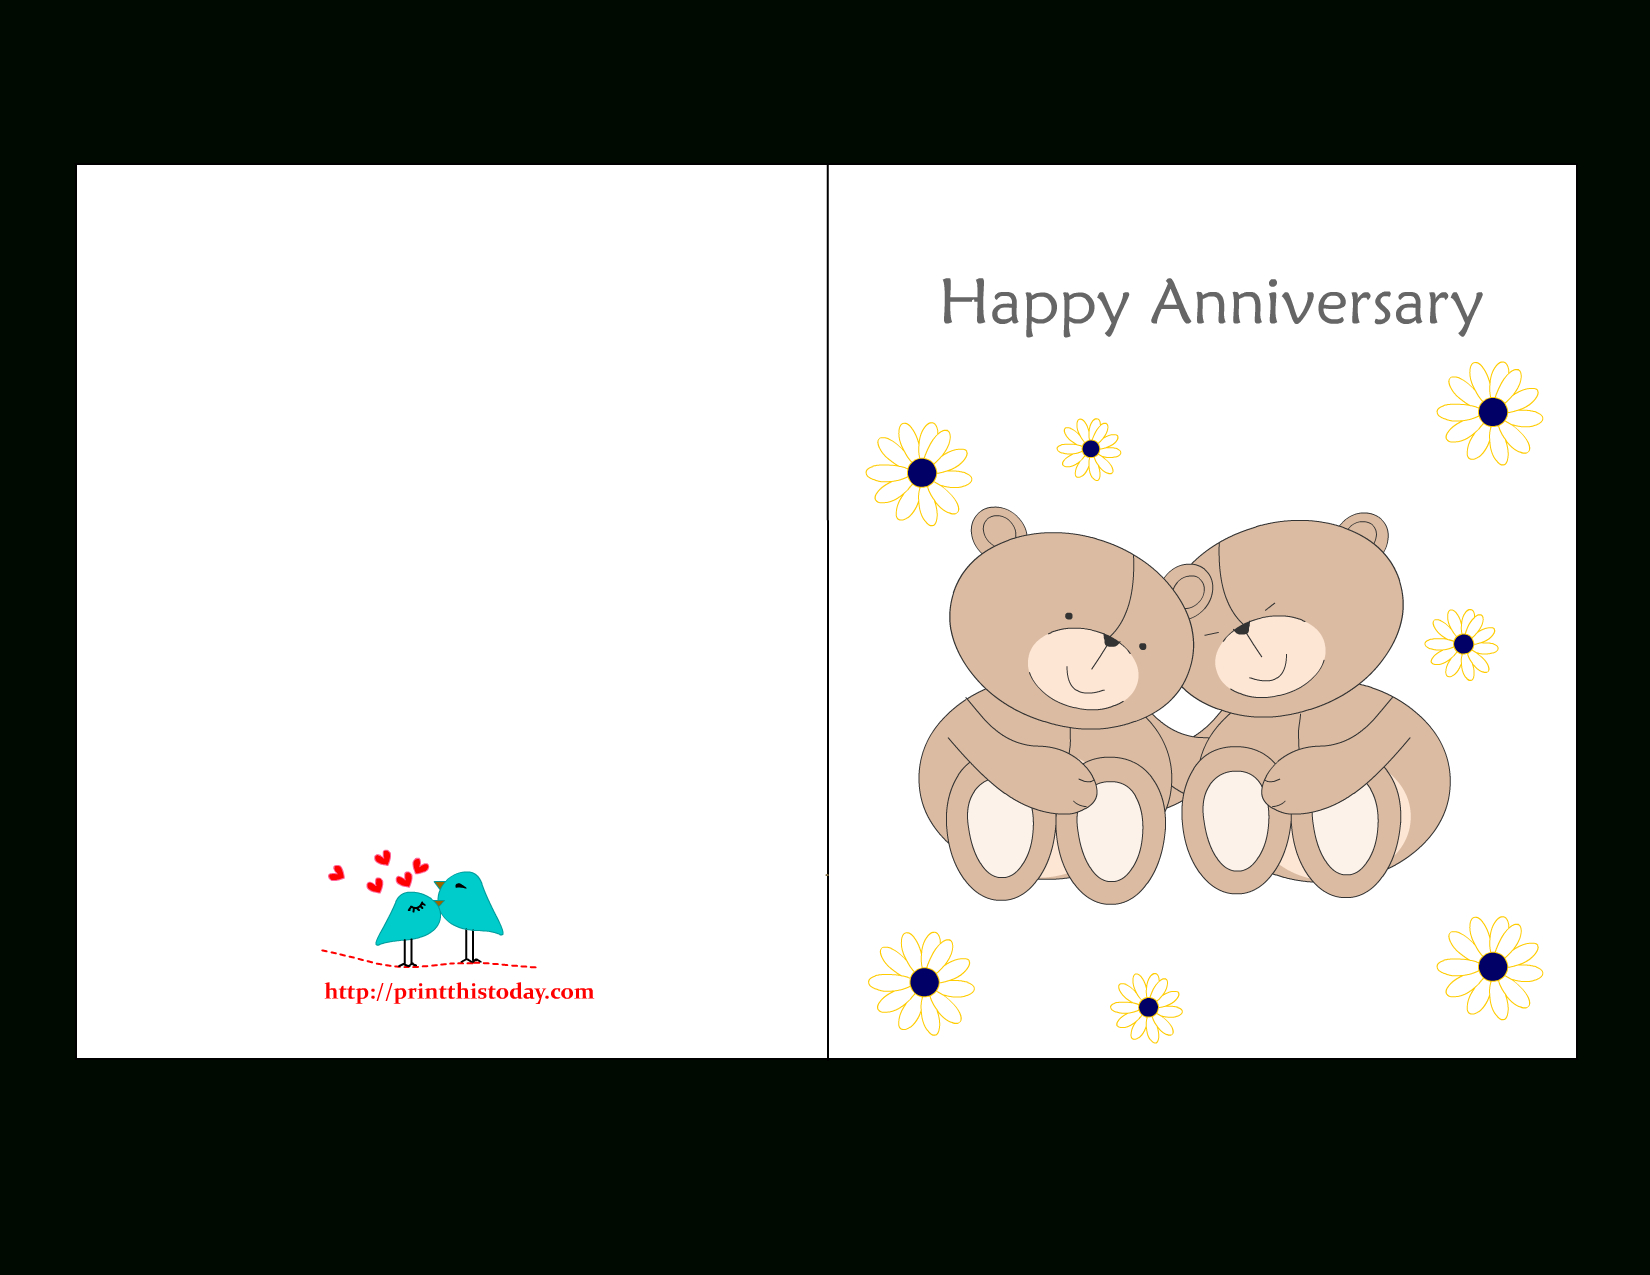 Free Printable Anniversary Cards - Printable Cards Free Anniversary